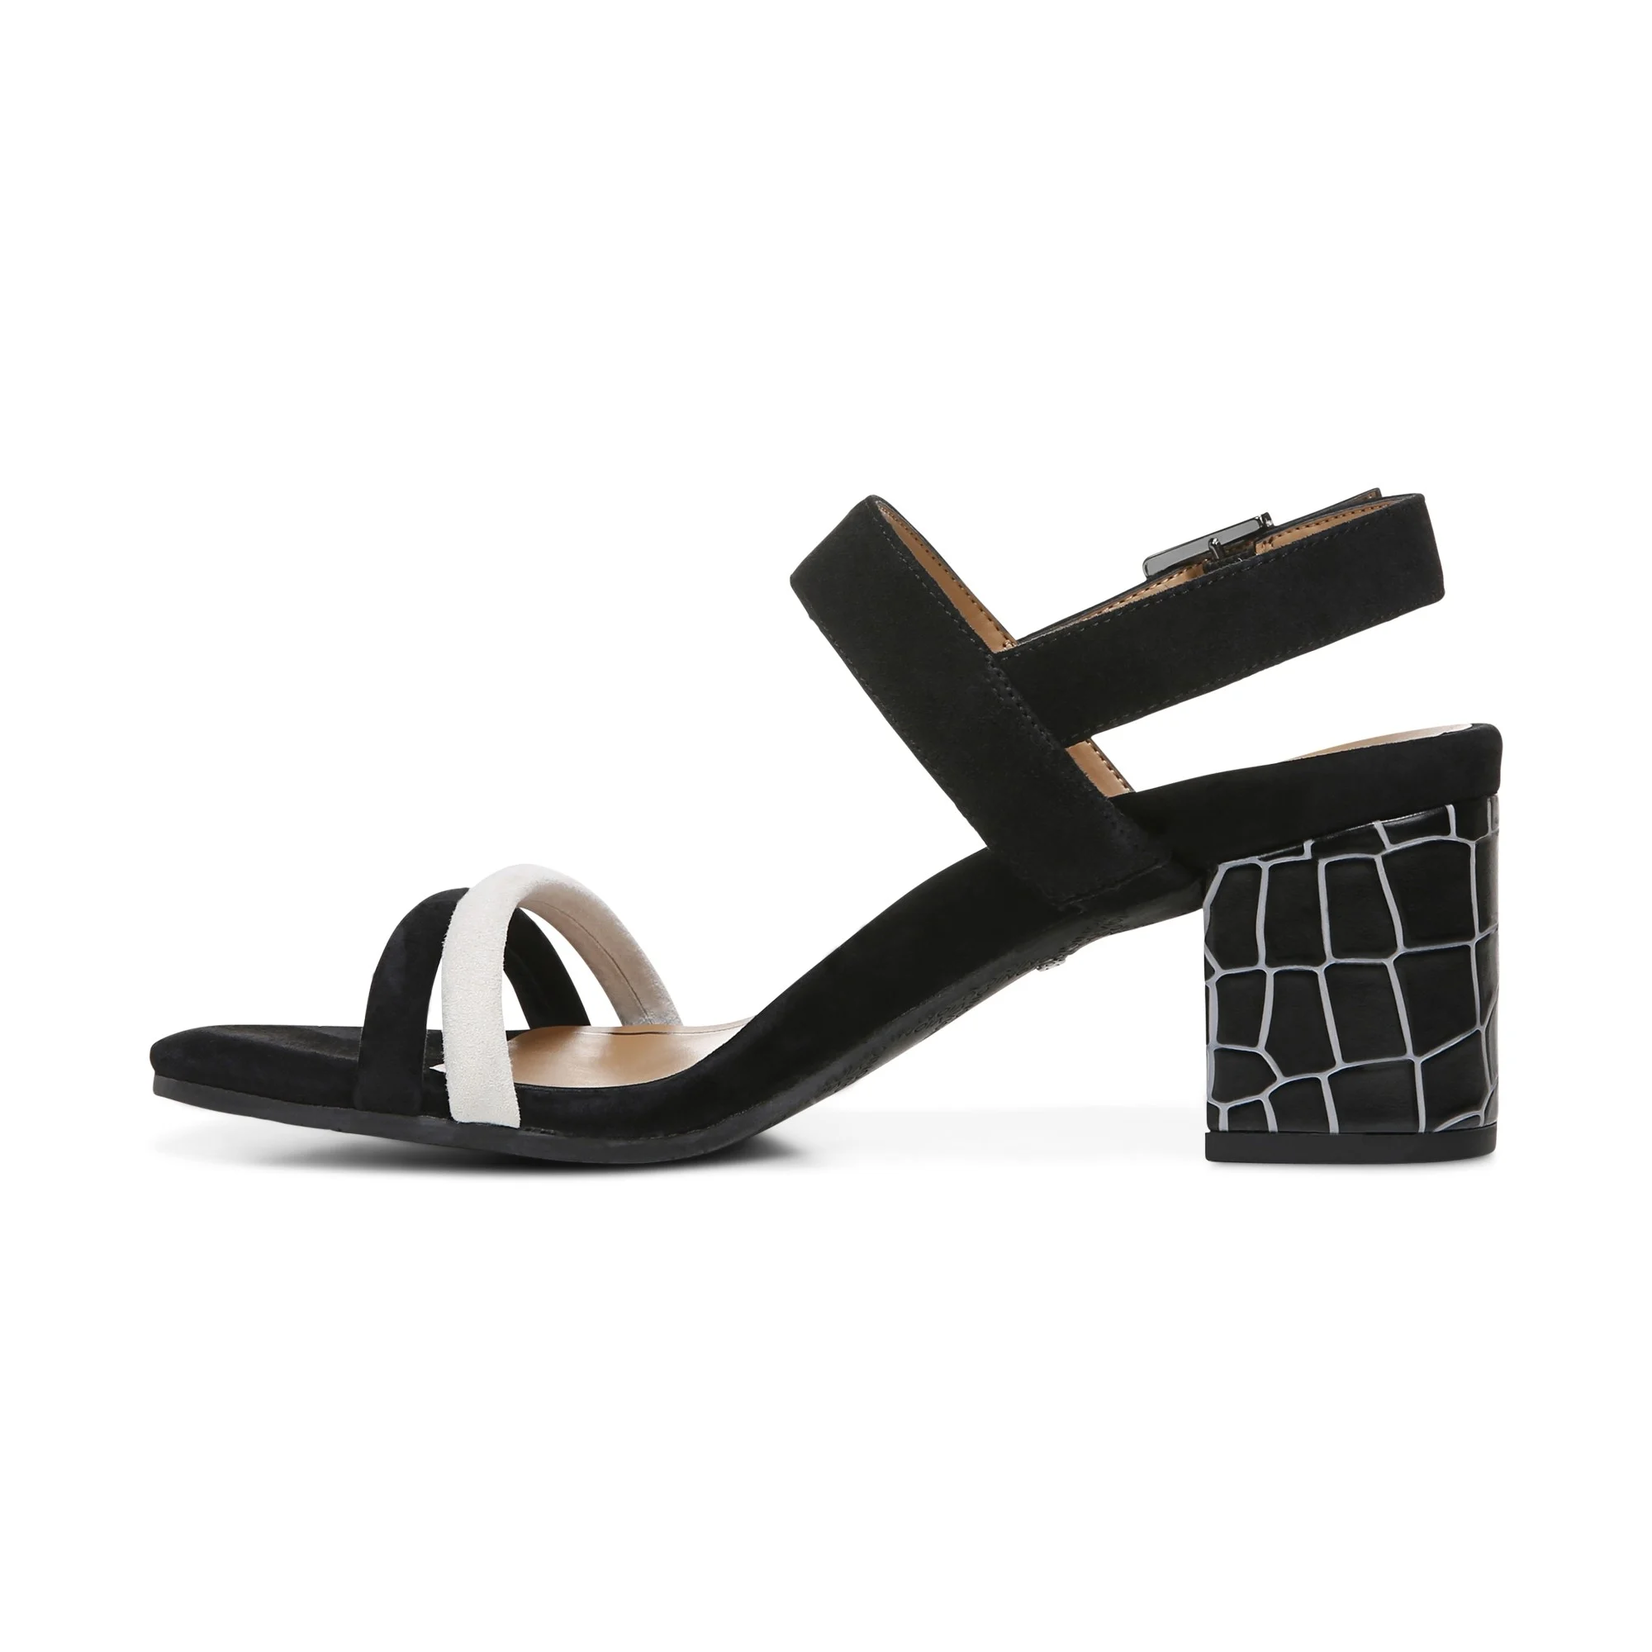 Vionic Paula Block Heel Sandal